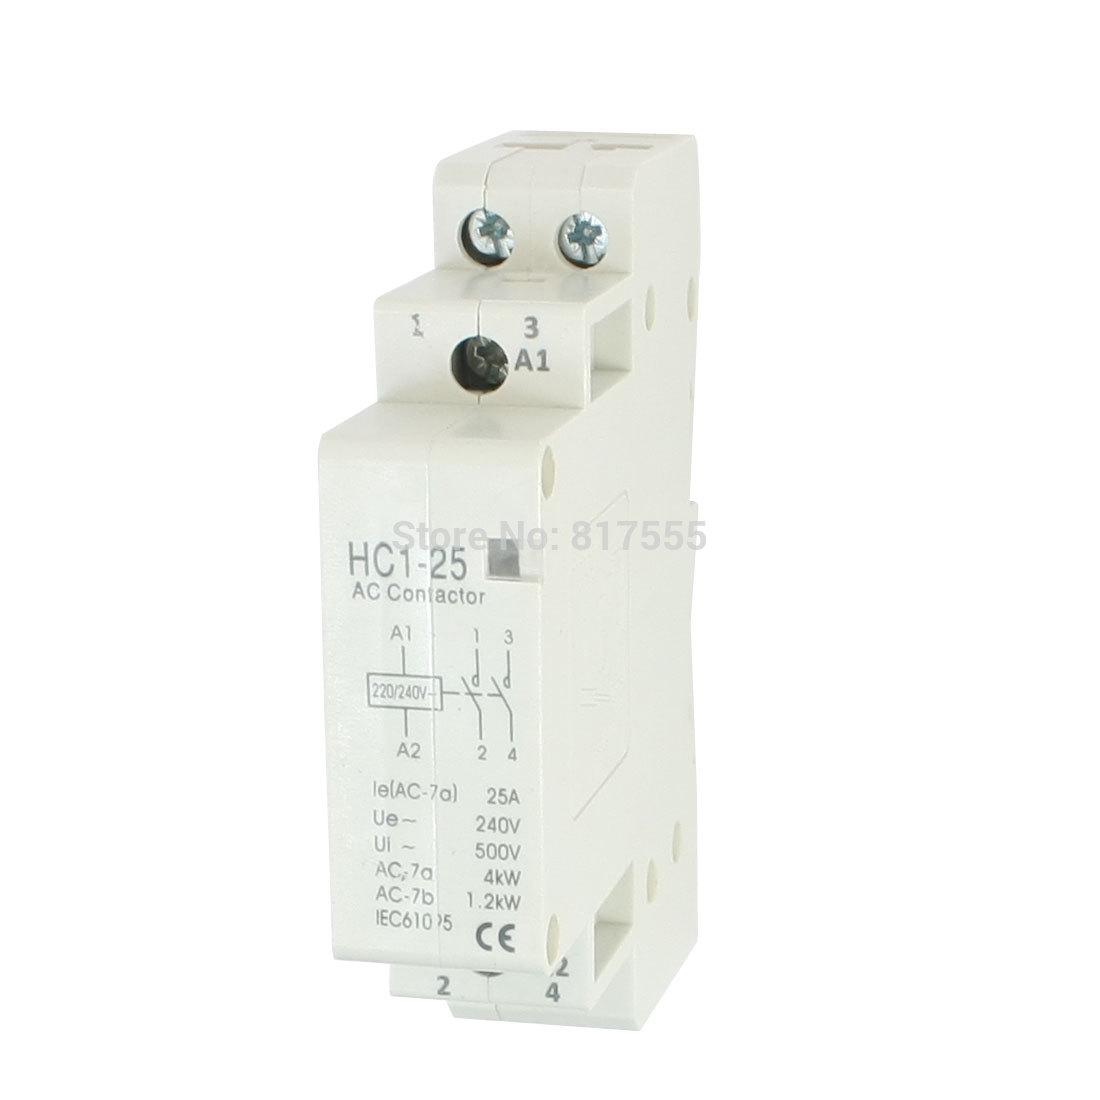 Замыкатель UX Motor AC240V 25 2 2P AC 35 DIN HC1-25  замыкатель ux motor lc1d09 ac 110 50 60 3 nc